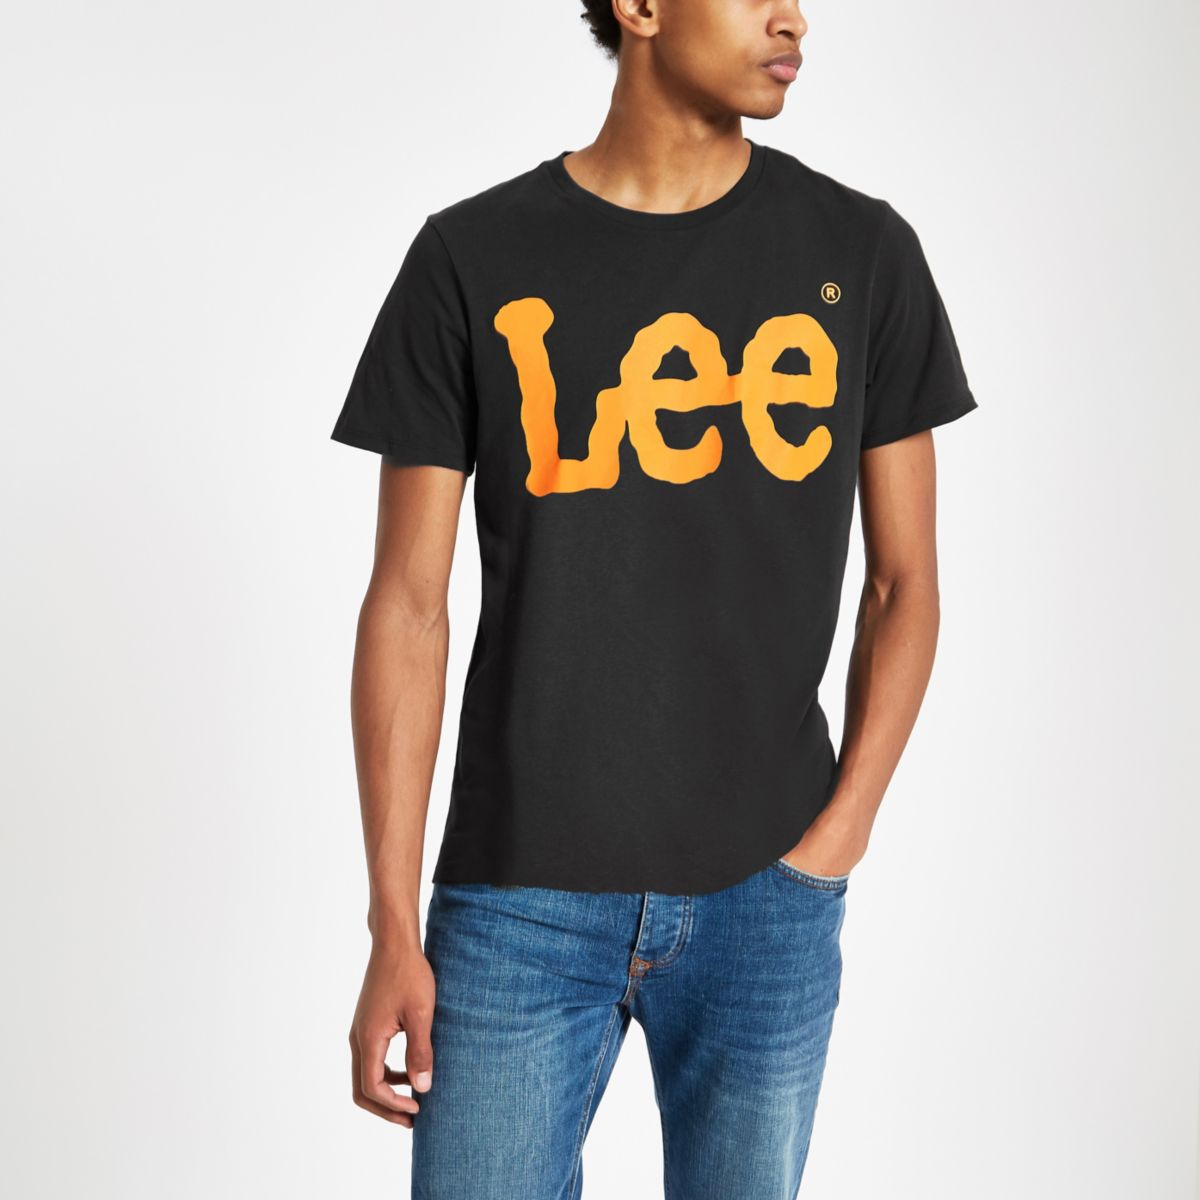 Lee black logo print crew neck T-shirt